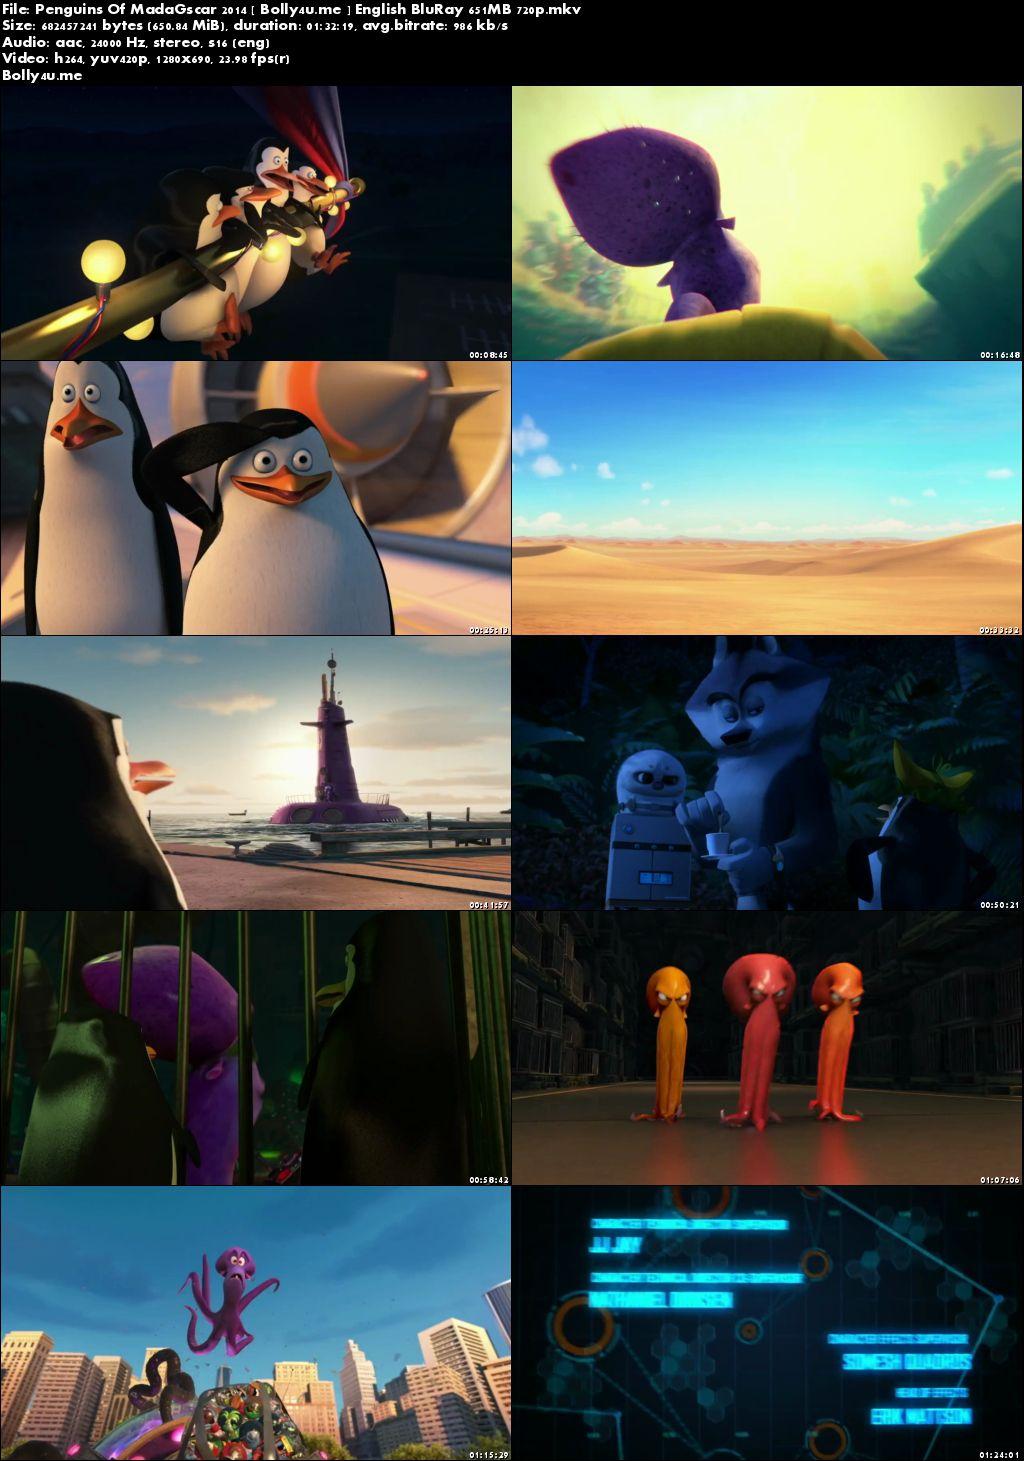 Penguins Of MadaGascar 2014 BluRay 280MB English Movie 480p Download